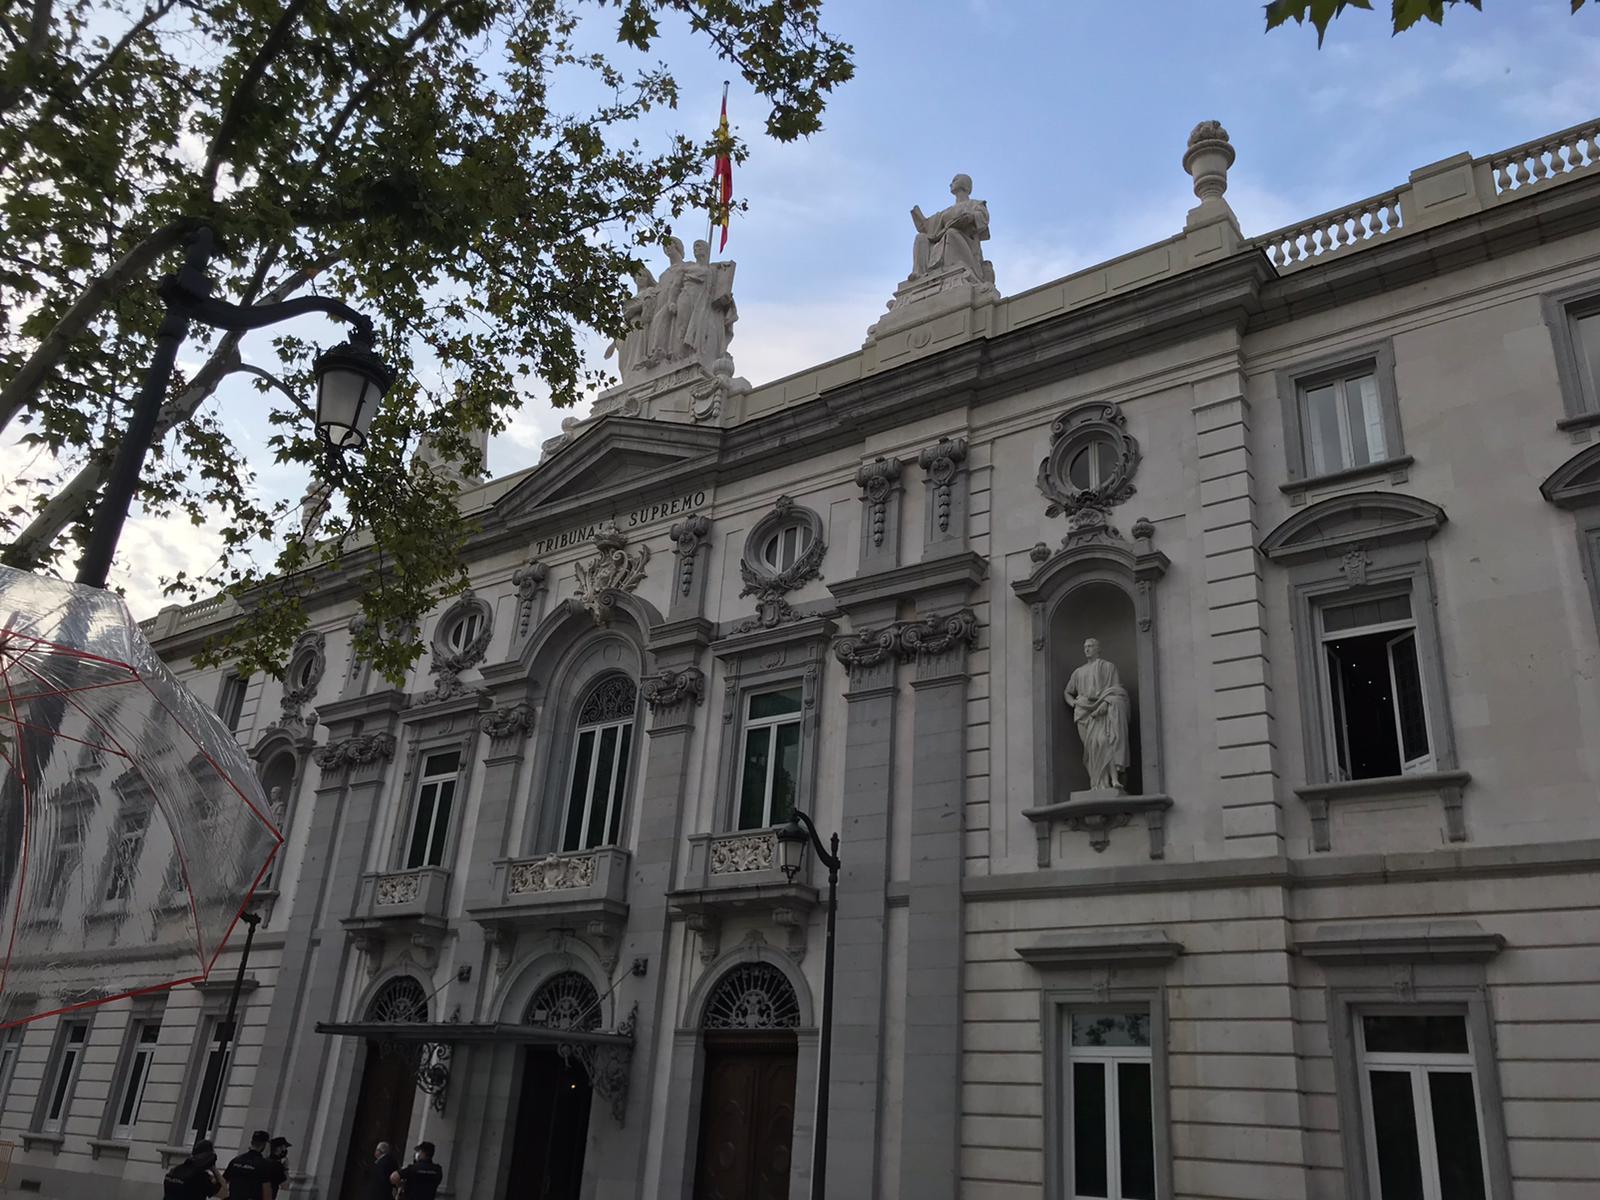 La fa?ana del Tribunal Suprem, a Madrid / Q.S.